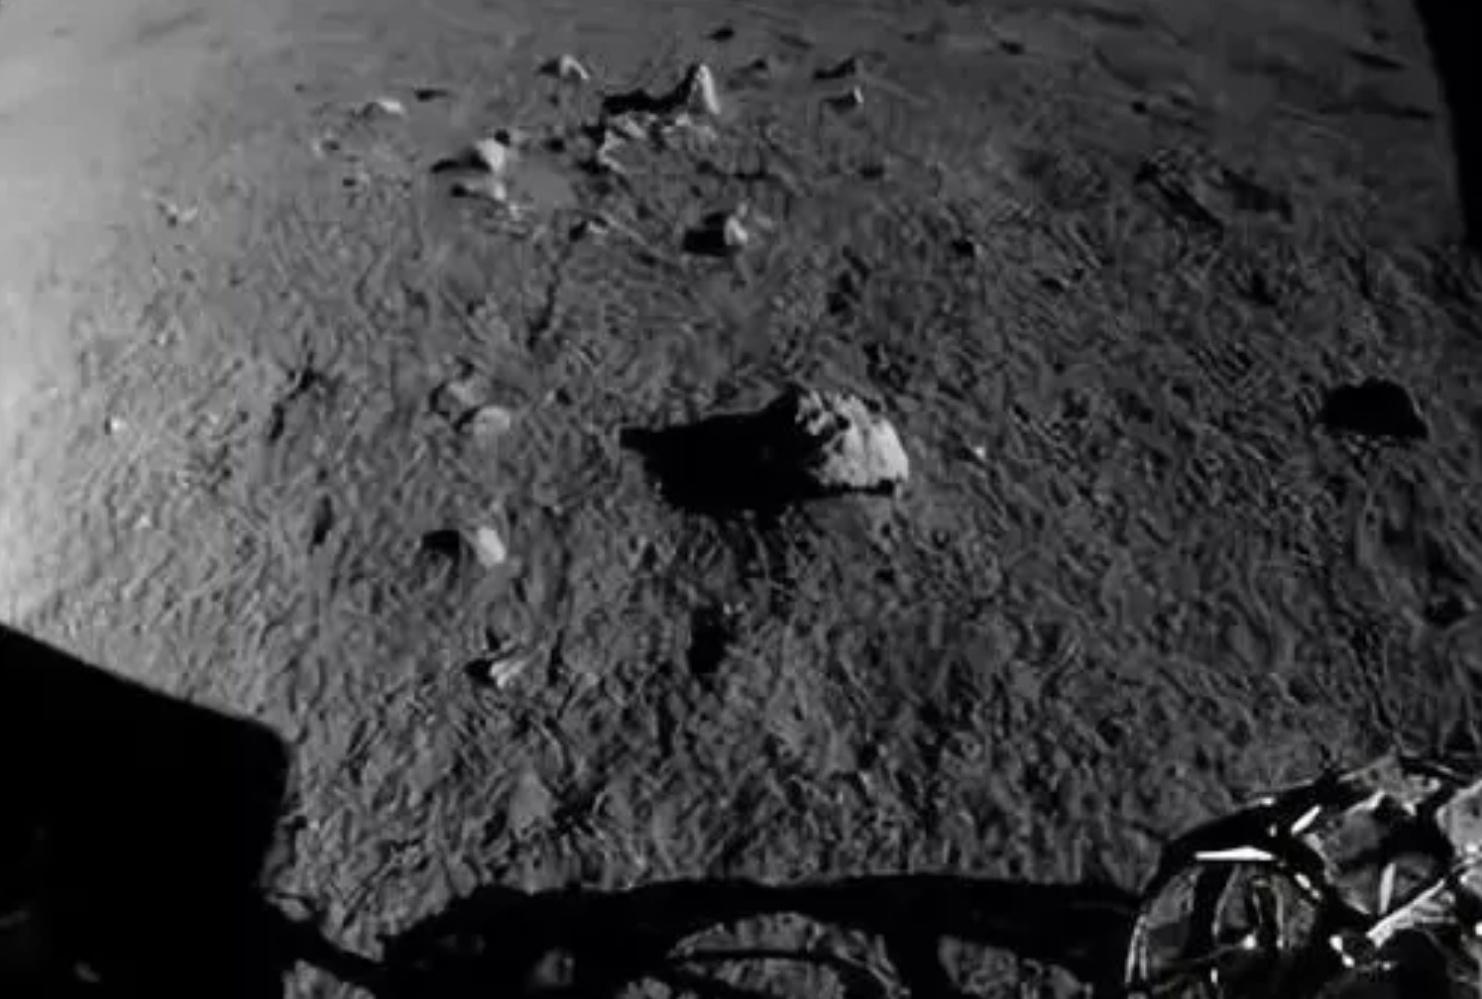 Миссия «Чанъэ-4» — третий лунный день. Ровер «Юйту-2» в поисках… камней - 1